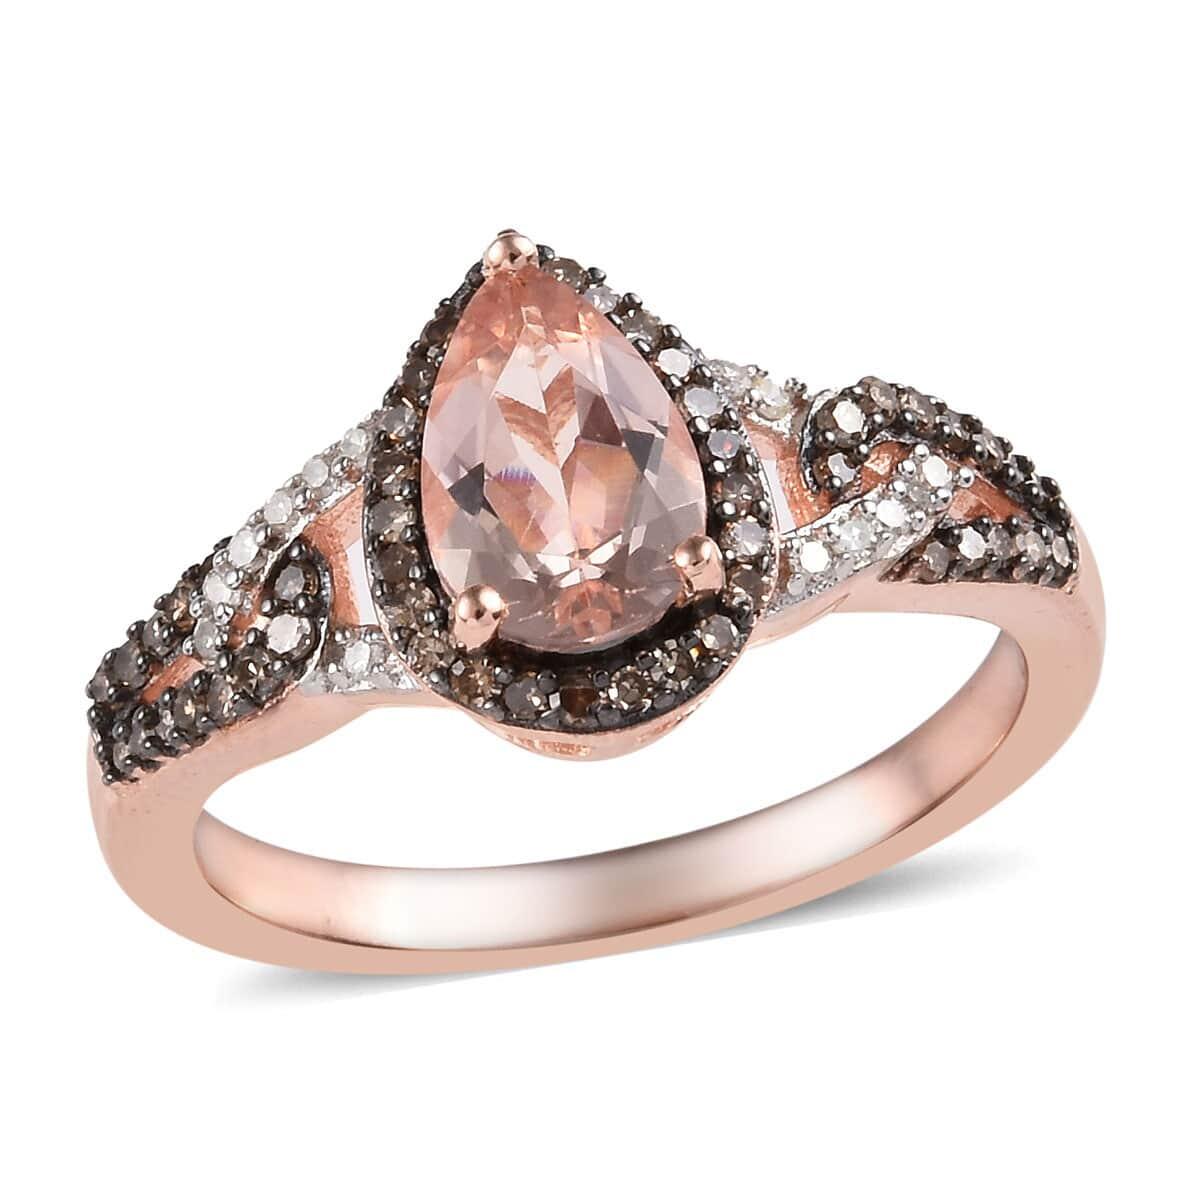 Marropino Morganite, Natural Champagne & White Diamond (0.32 ct) Ring in Rhodium & Vermeil RG Over Sterling Silver (Size 7.0) 1.52 ctw